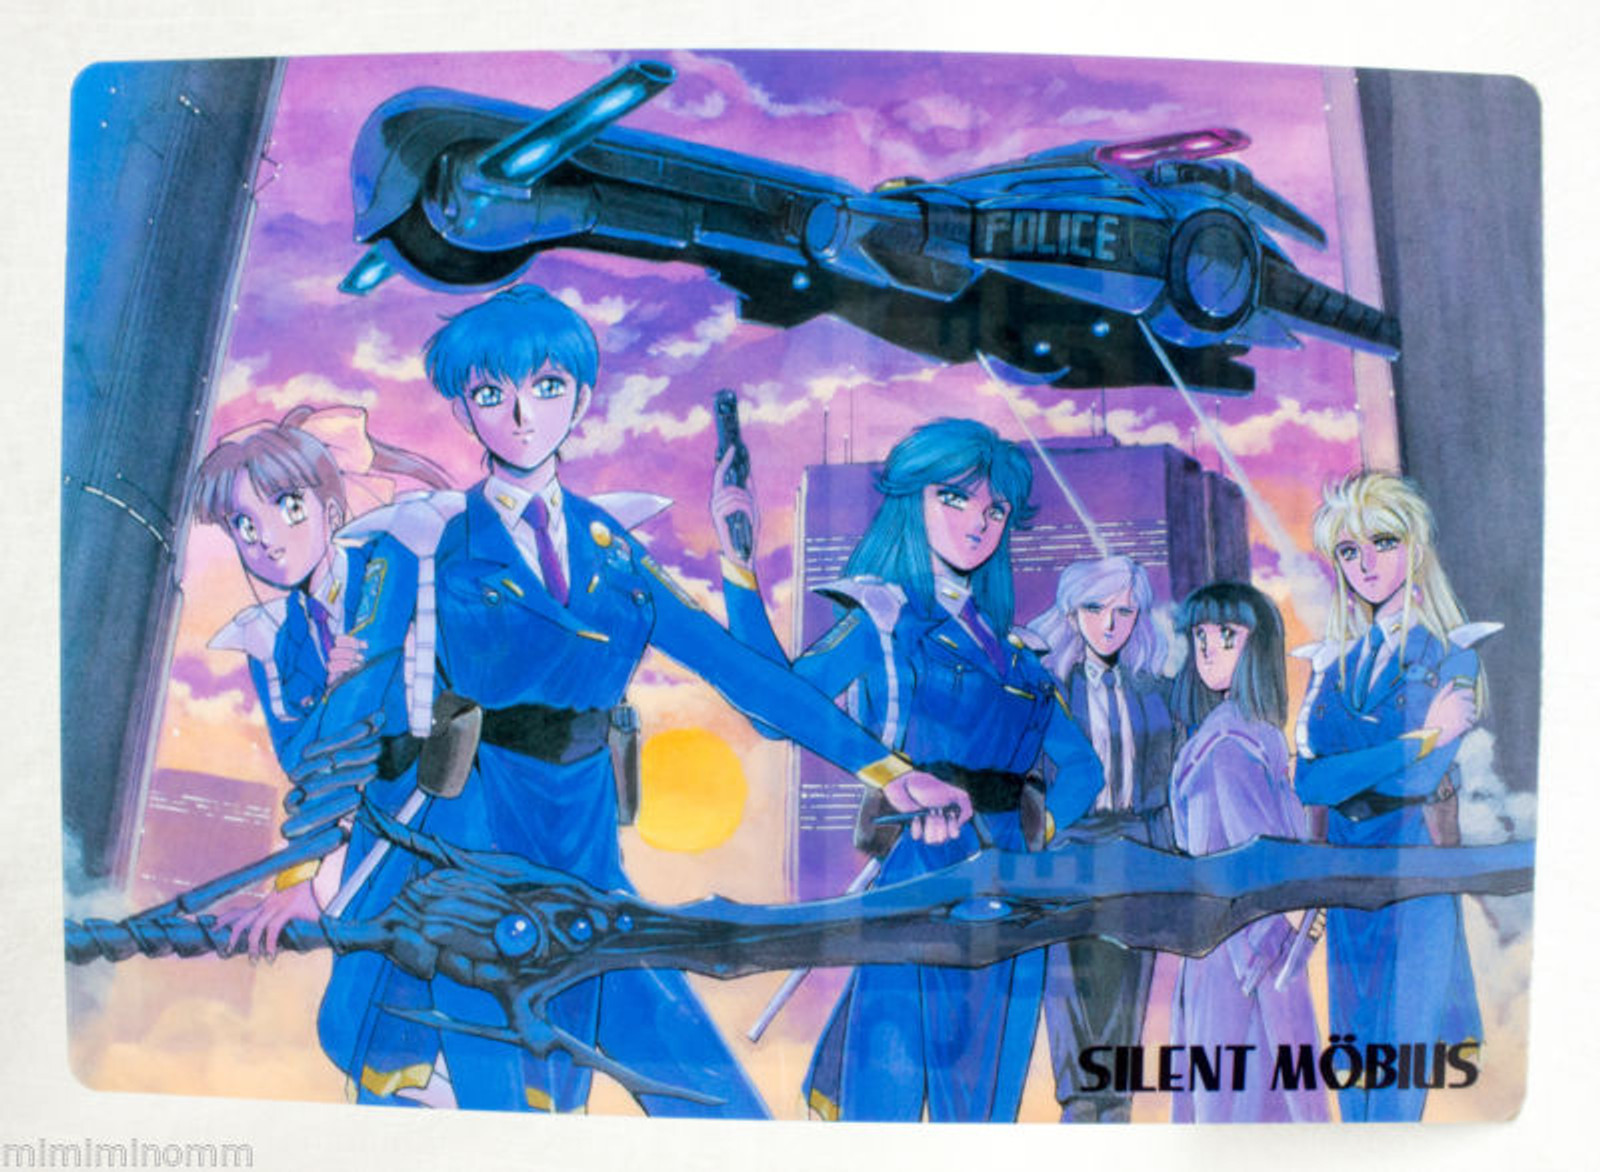 Silent Mobius Shitajiki Plastic Pencil Board Pad JAPAN ANIME MANGA 2